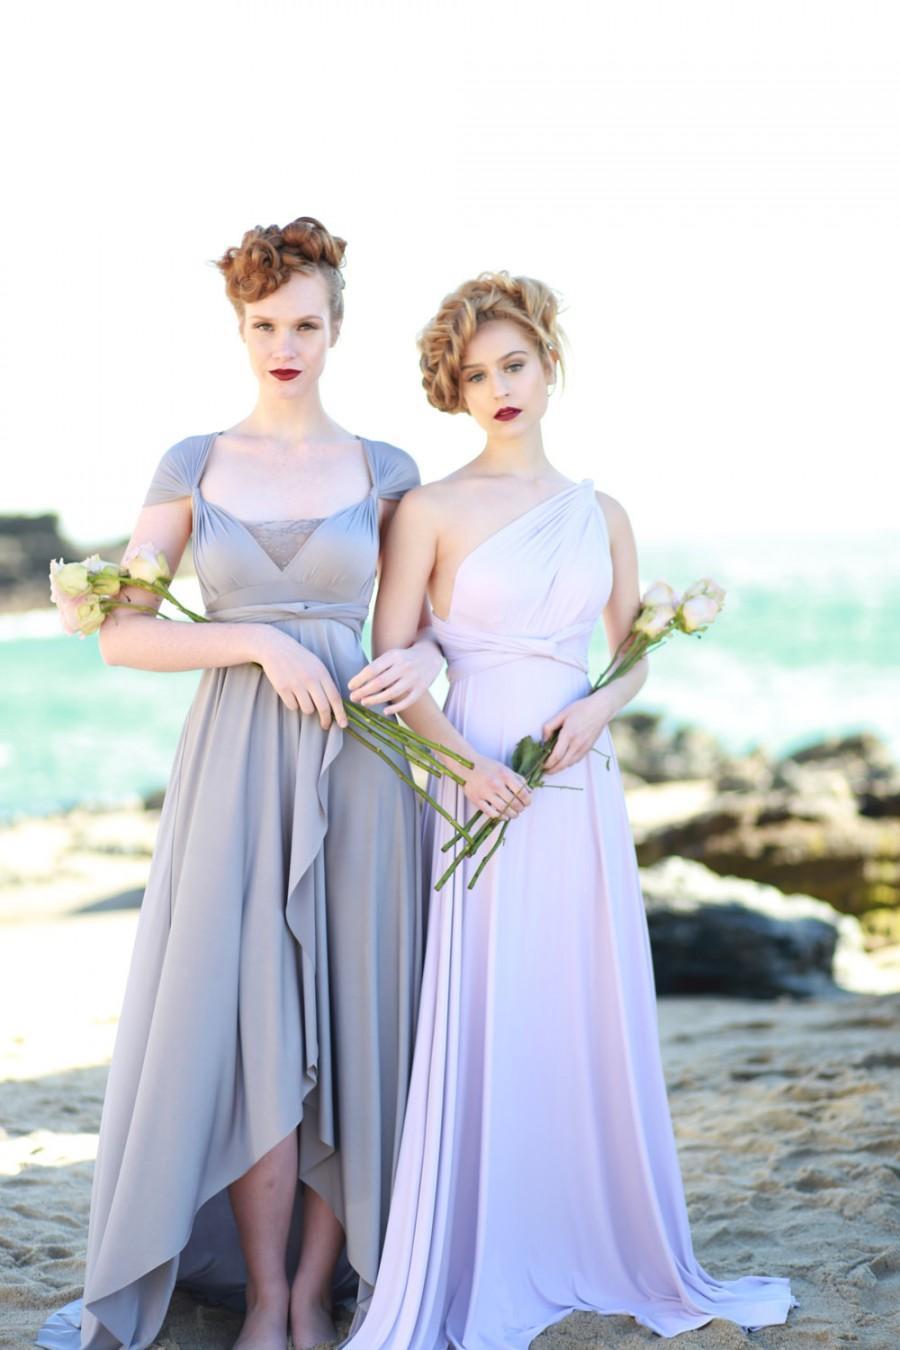 زفاف - Mismatched Bridesmaids~ Dockside Grey Satin- TULIP HEM CUT Octopus Convertible Infinity Wrap Dress~Bohemian Bridal, Beach Wedding